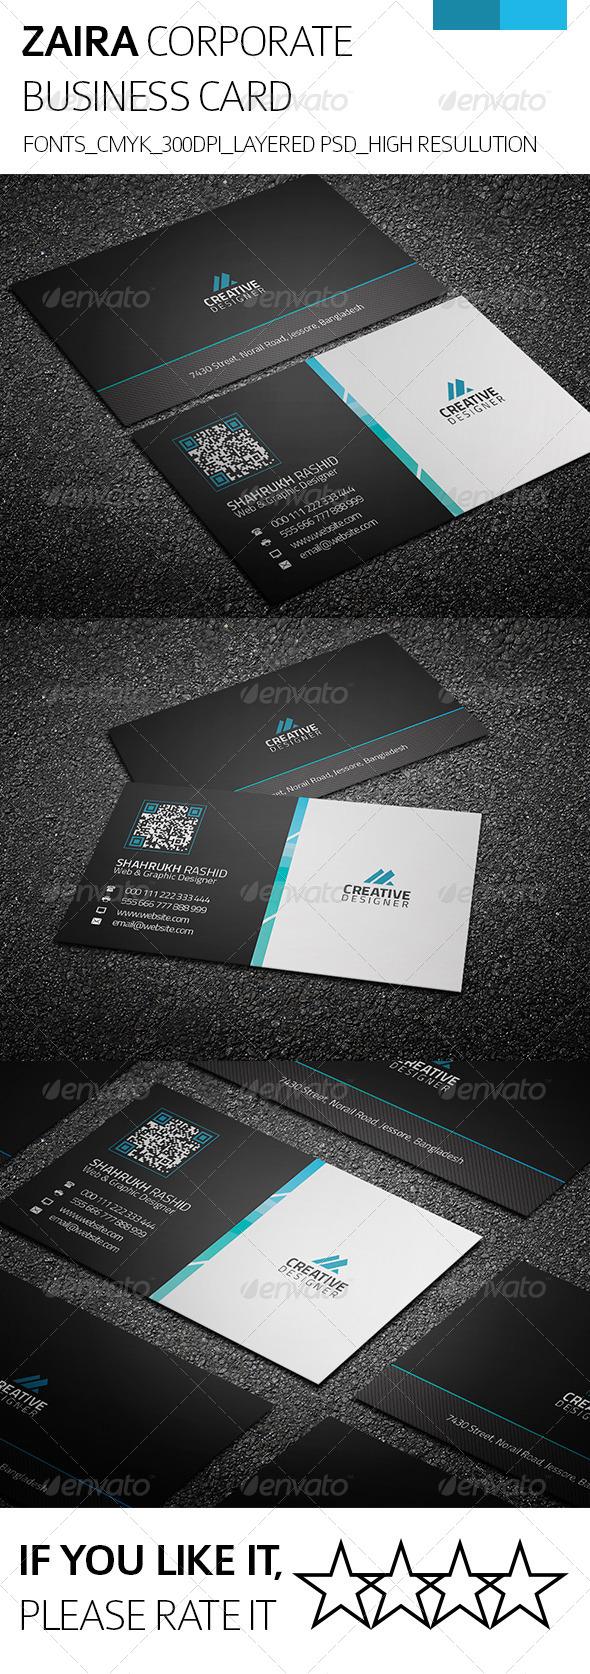 Zaira & Corporate Business Card - Corporate Business Cards